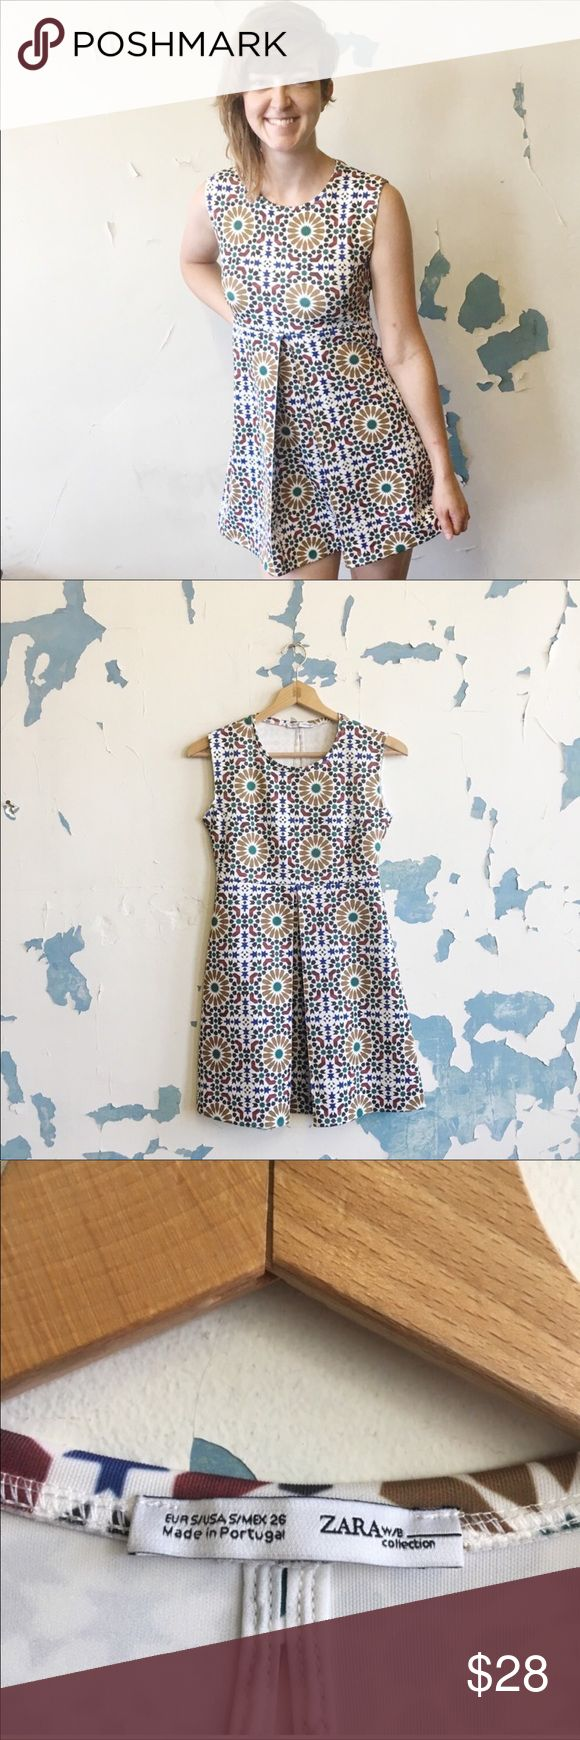 Zara   Geometric Aztec Print Neoprene Skater Dress This modern geometric print d…